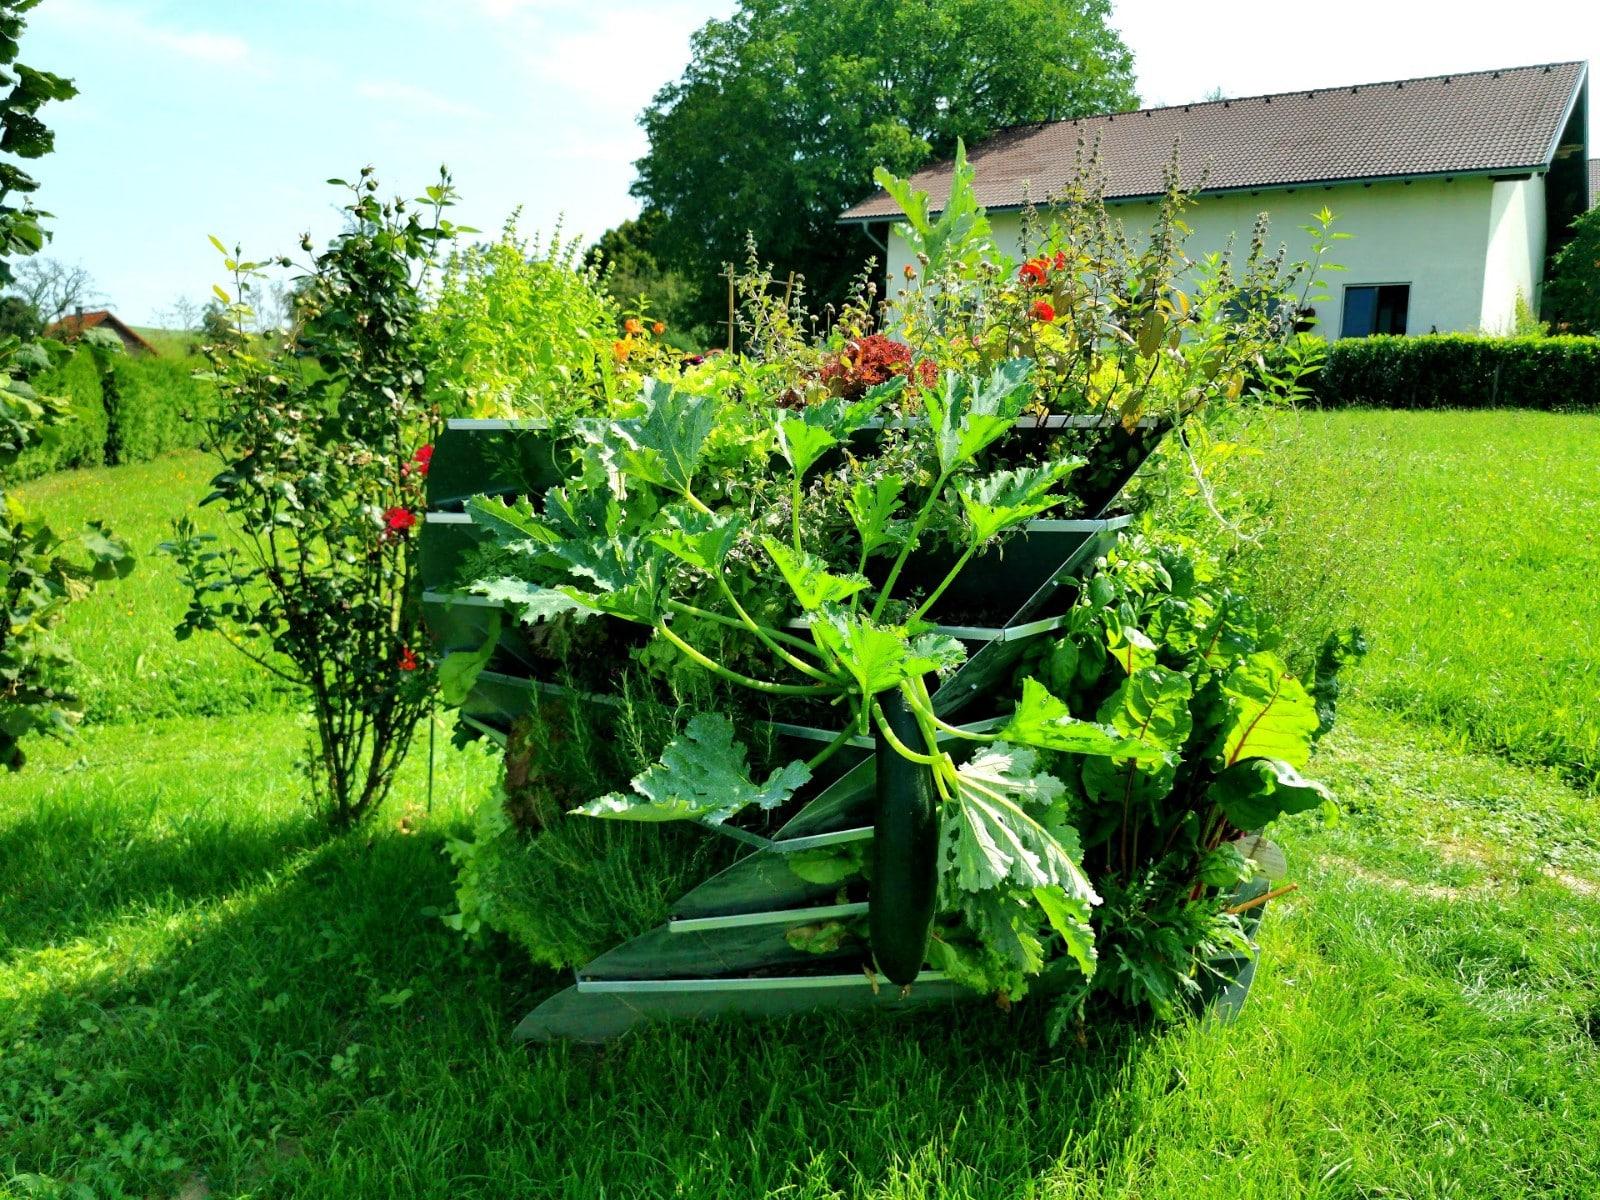 avantgarden-hochbeet-aus-metall-bepflanzt